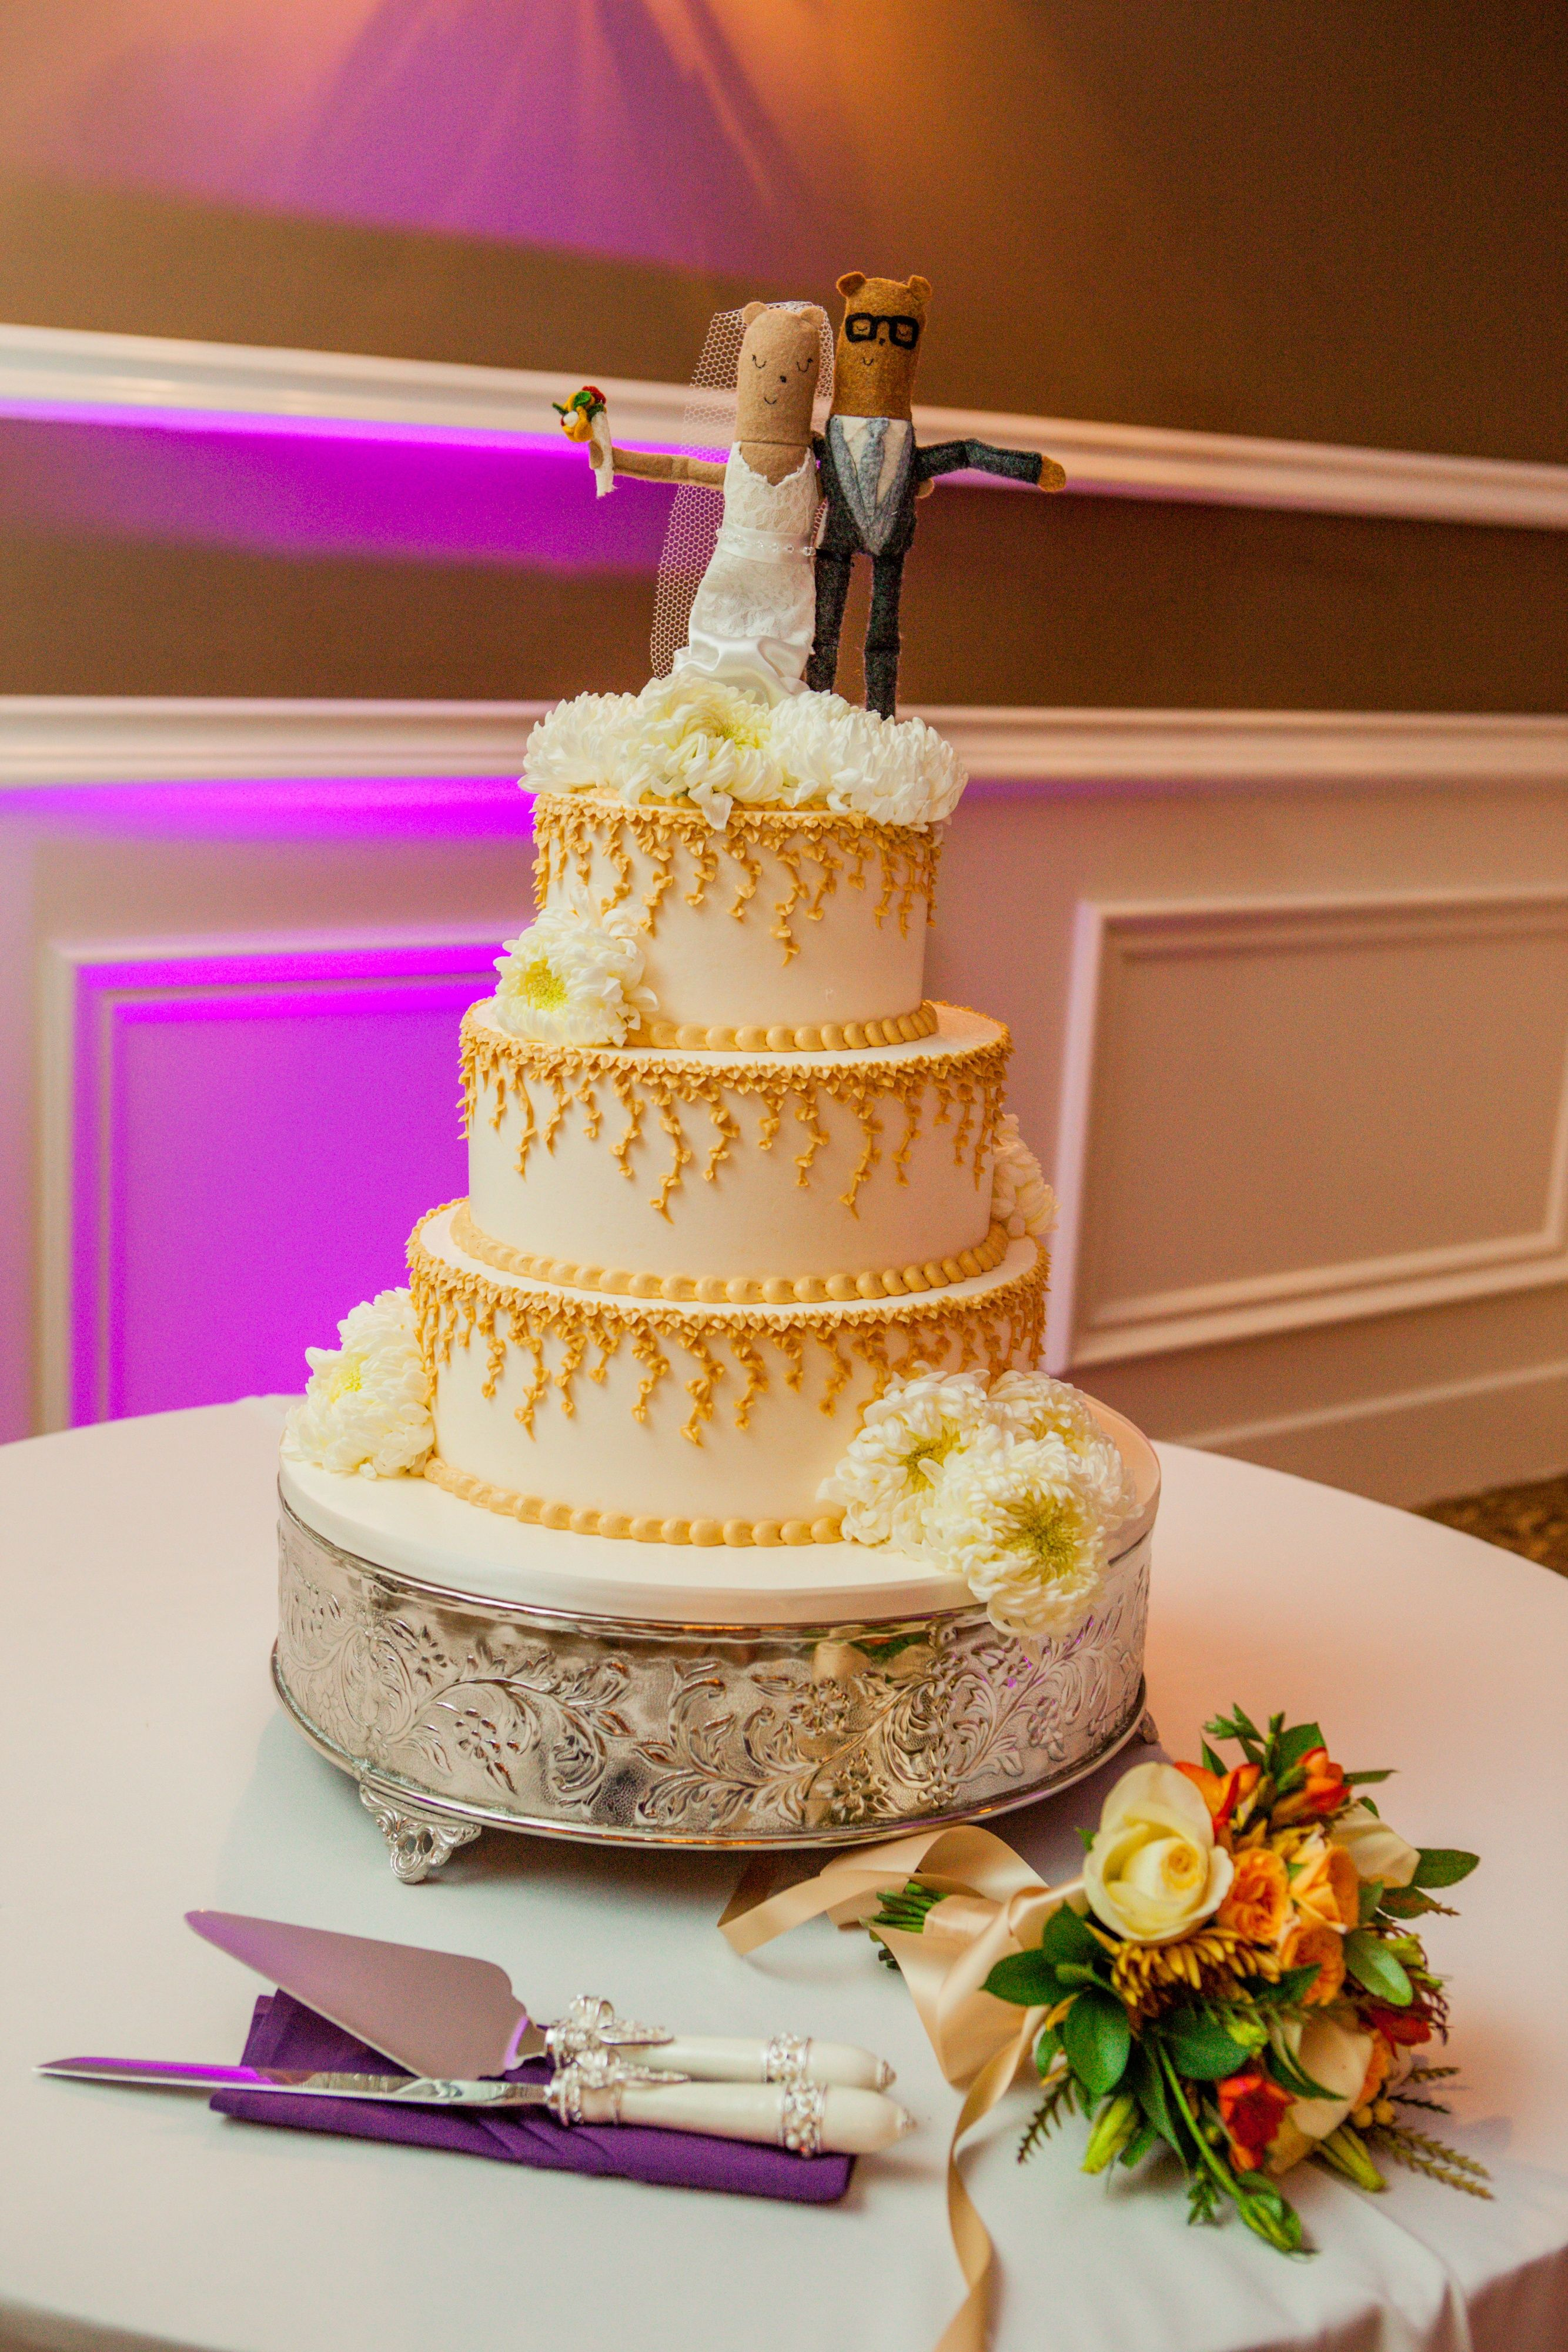 Felt Bear Cake Topper Rossmoor Pastries Wedding Cake Studios Beautiful Day Photography Theknot Com Wedding Cake Toppers Wedding Cakes